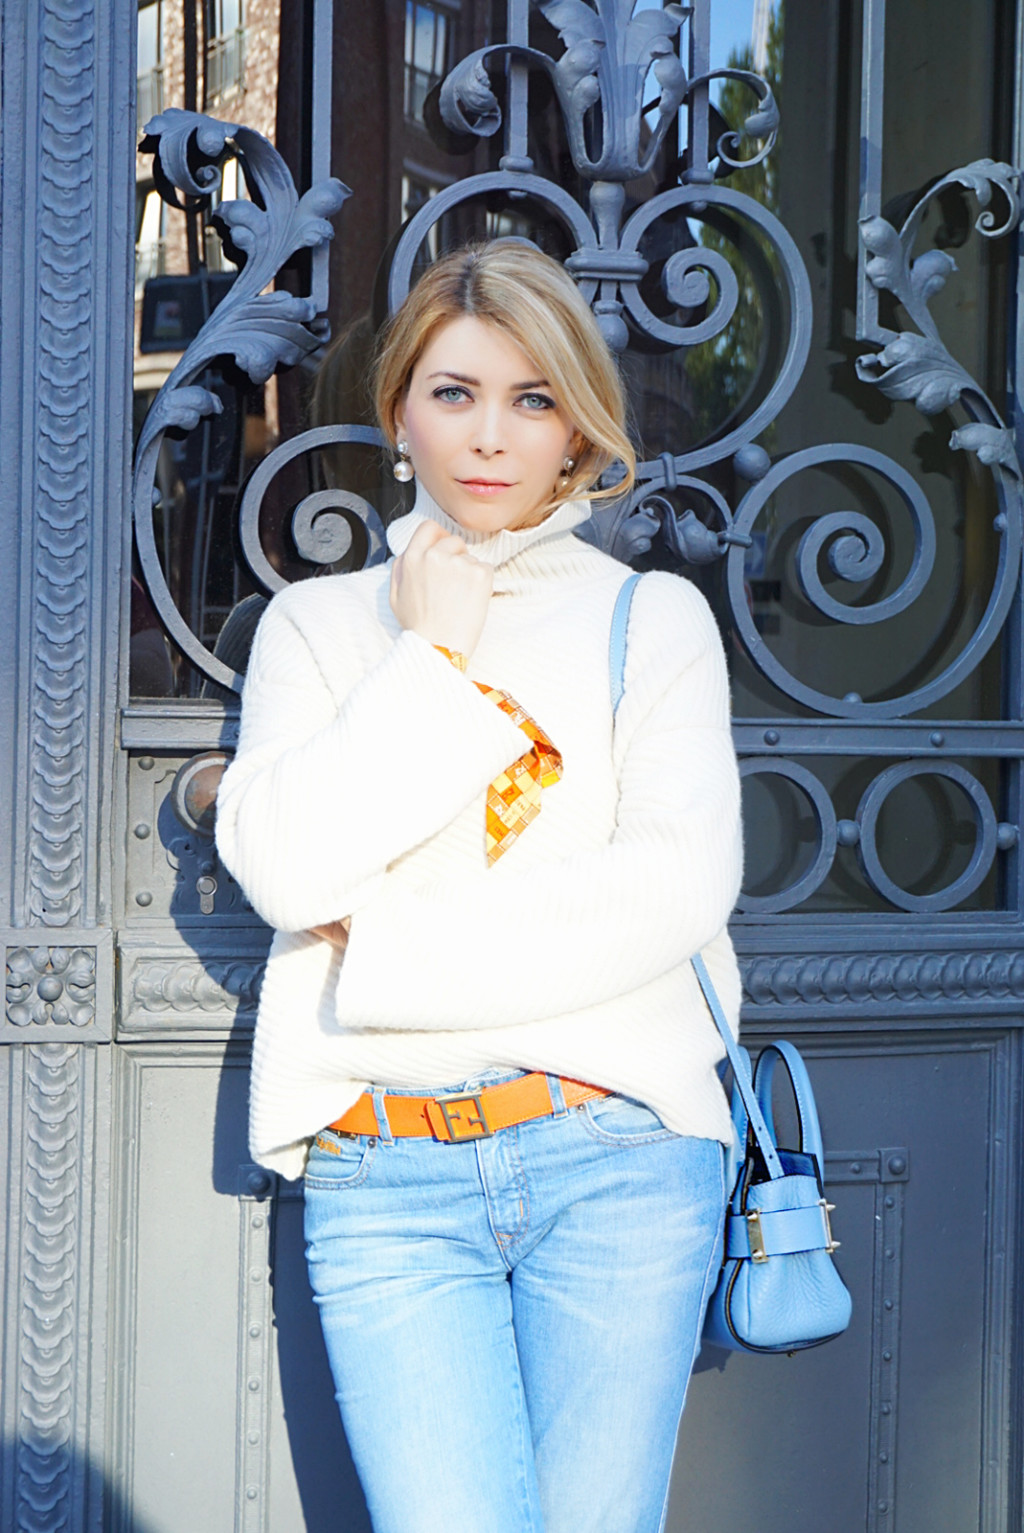 Sweater time - Yuliya Savytska